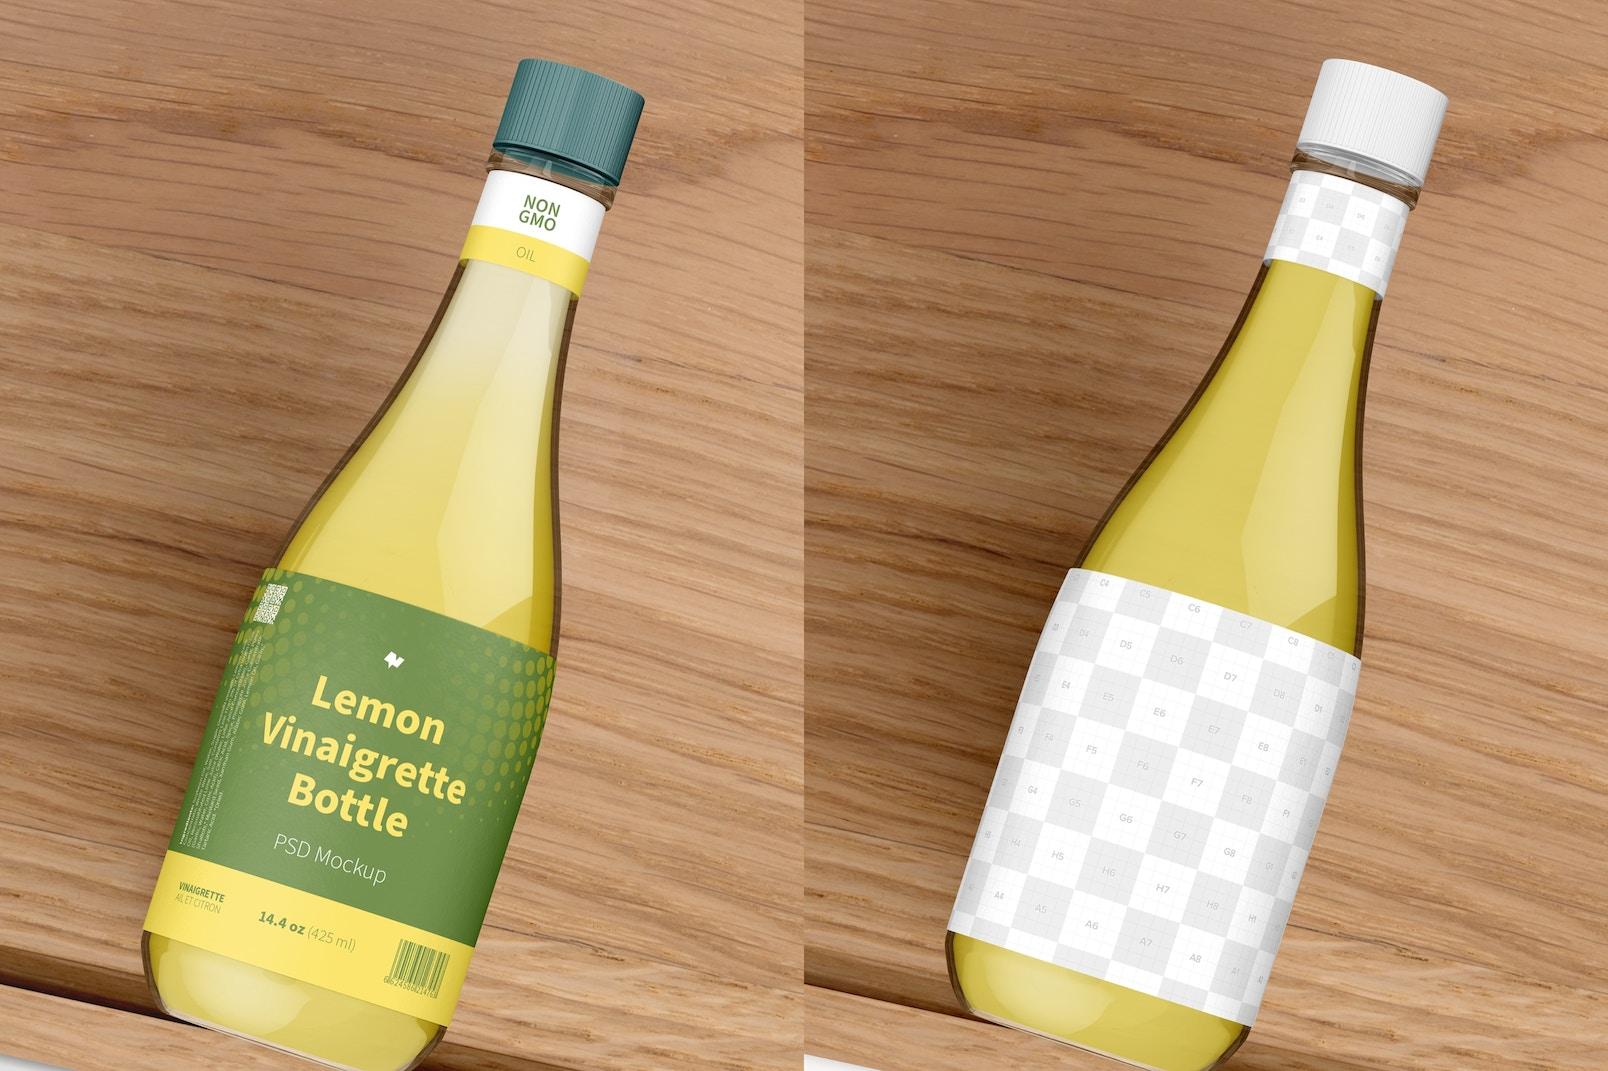 14.5 oz Lemon Vinaigrette Bottle Mockup, Top View